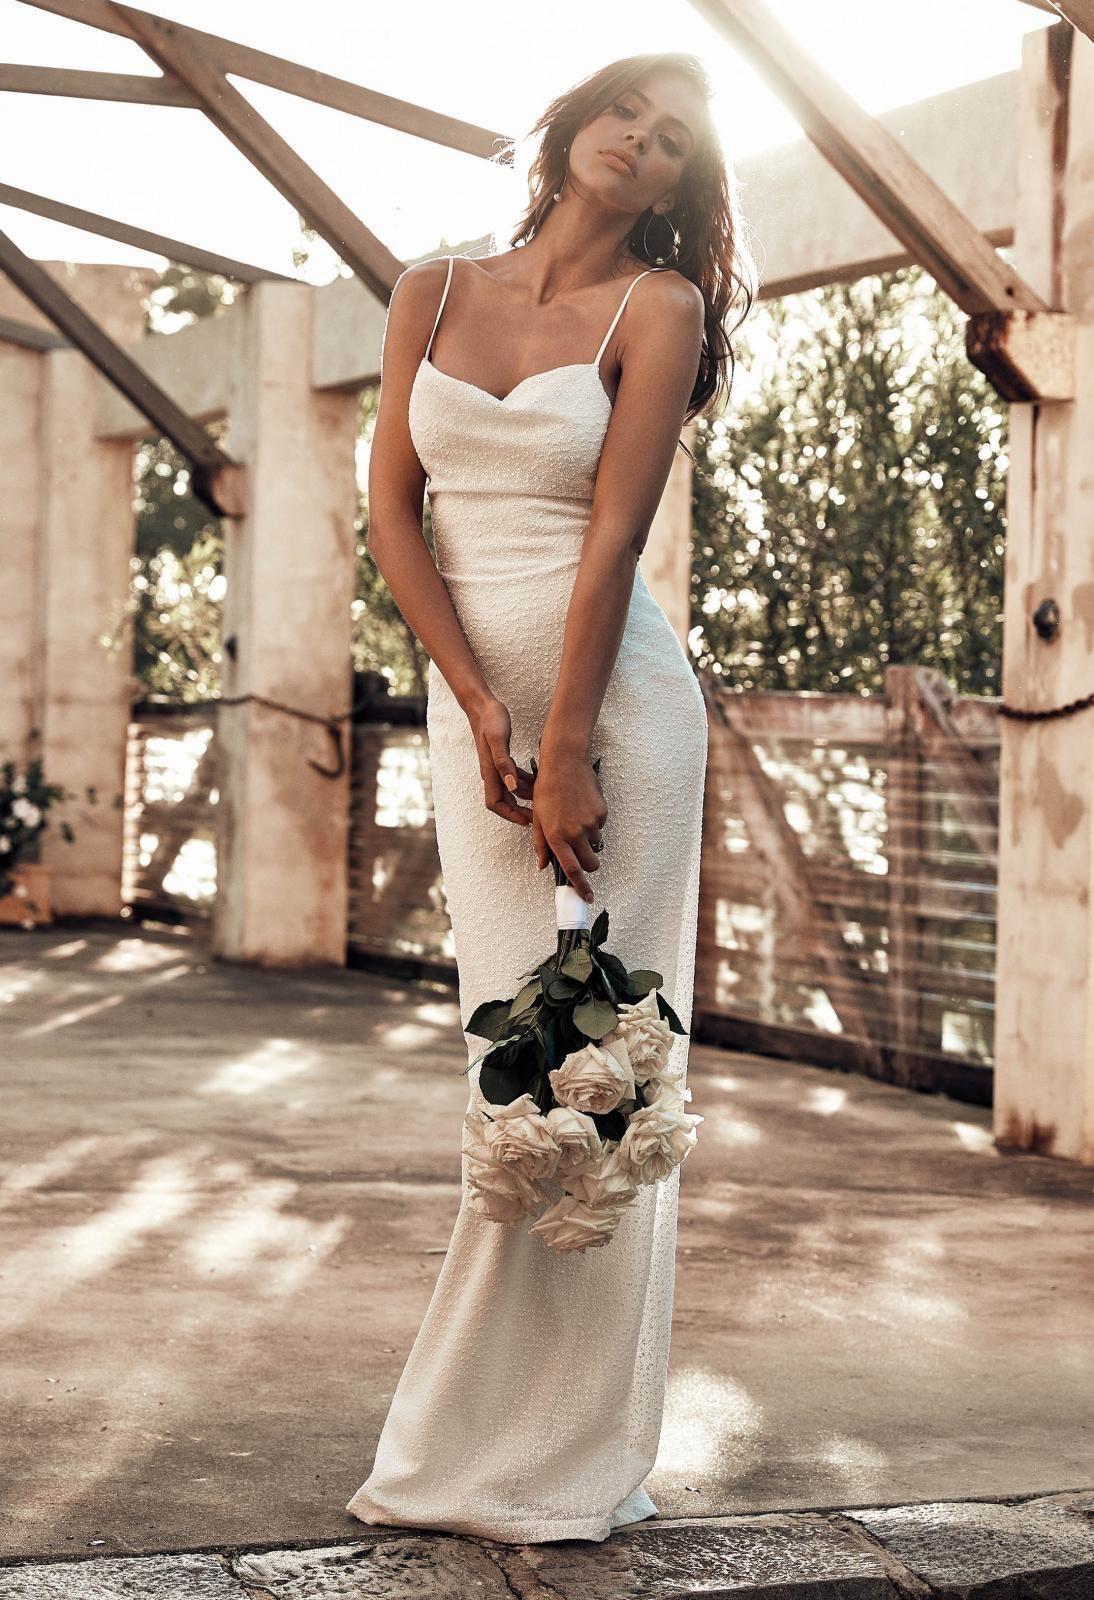 P I N T E R E S T Elyy Spaghetti Strap Wedding Dress Wedding Dresses With Straps Wedding Dresses Beaded